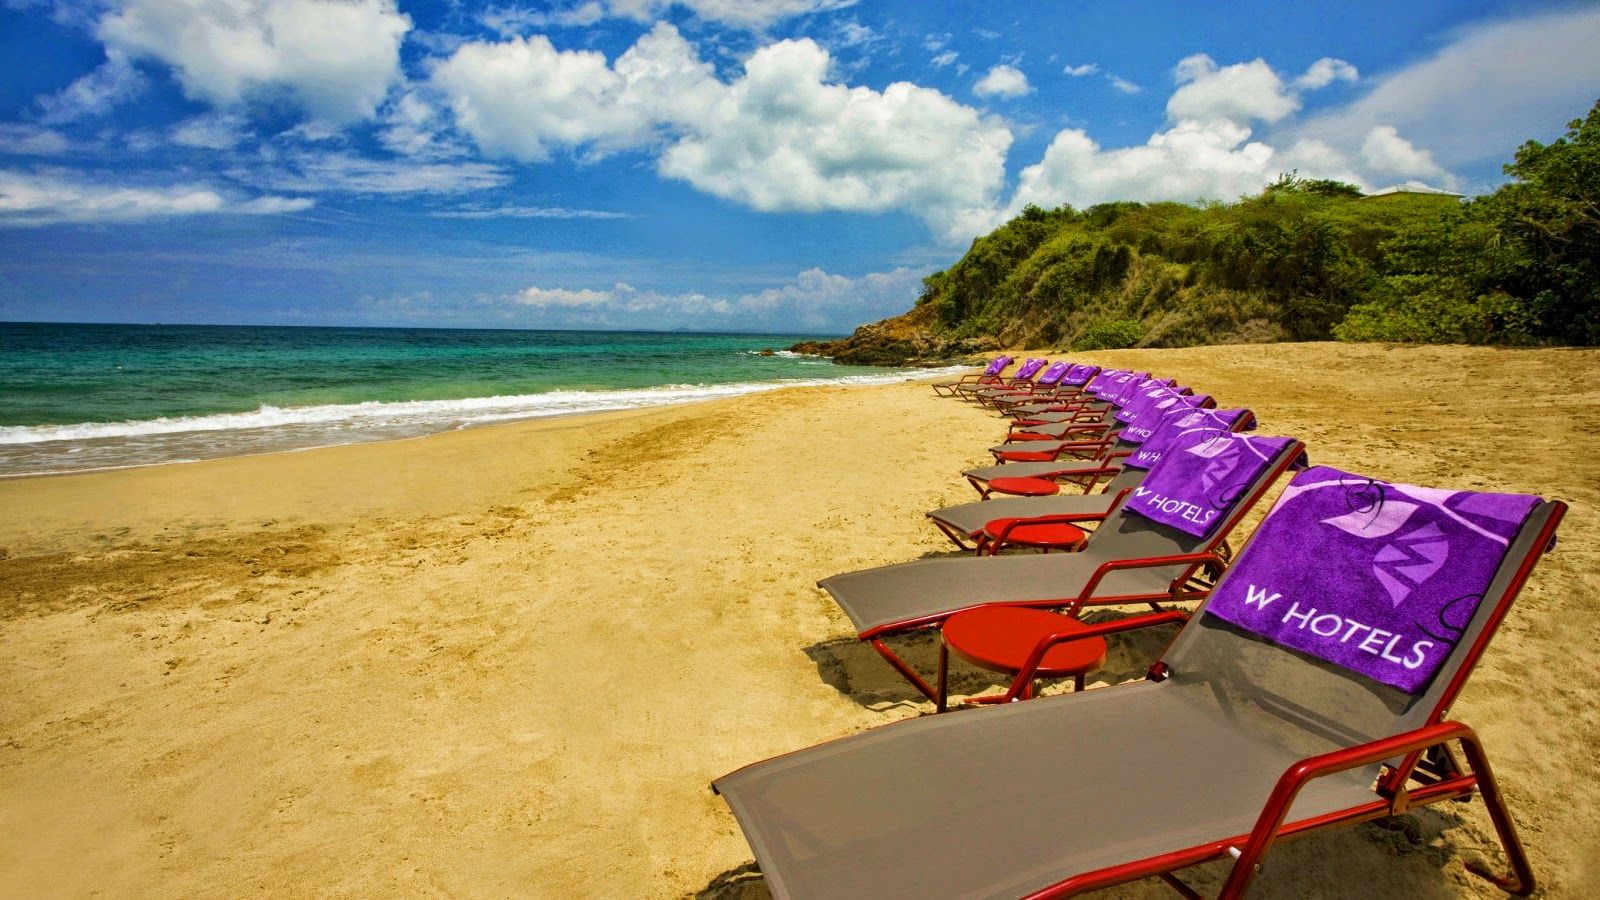 Sunsational Savings On Vieques Island Puerto Rico